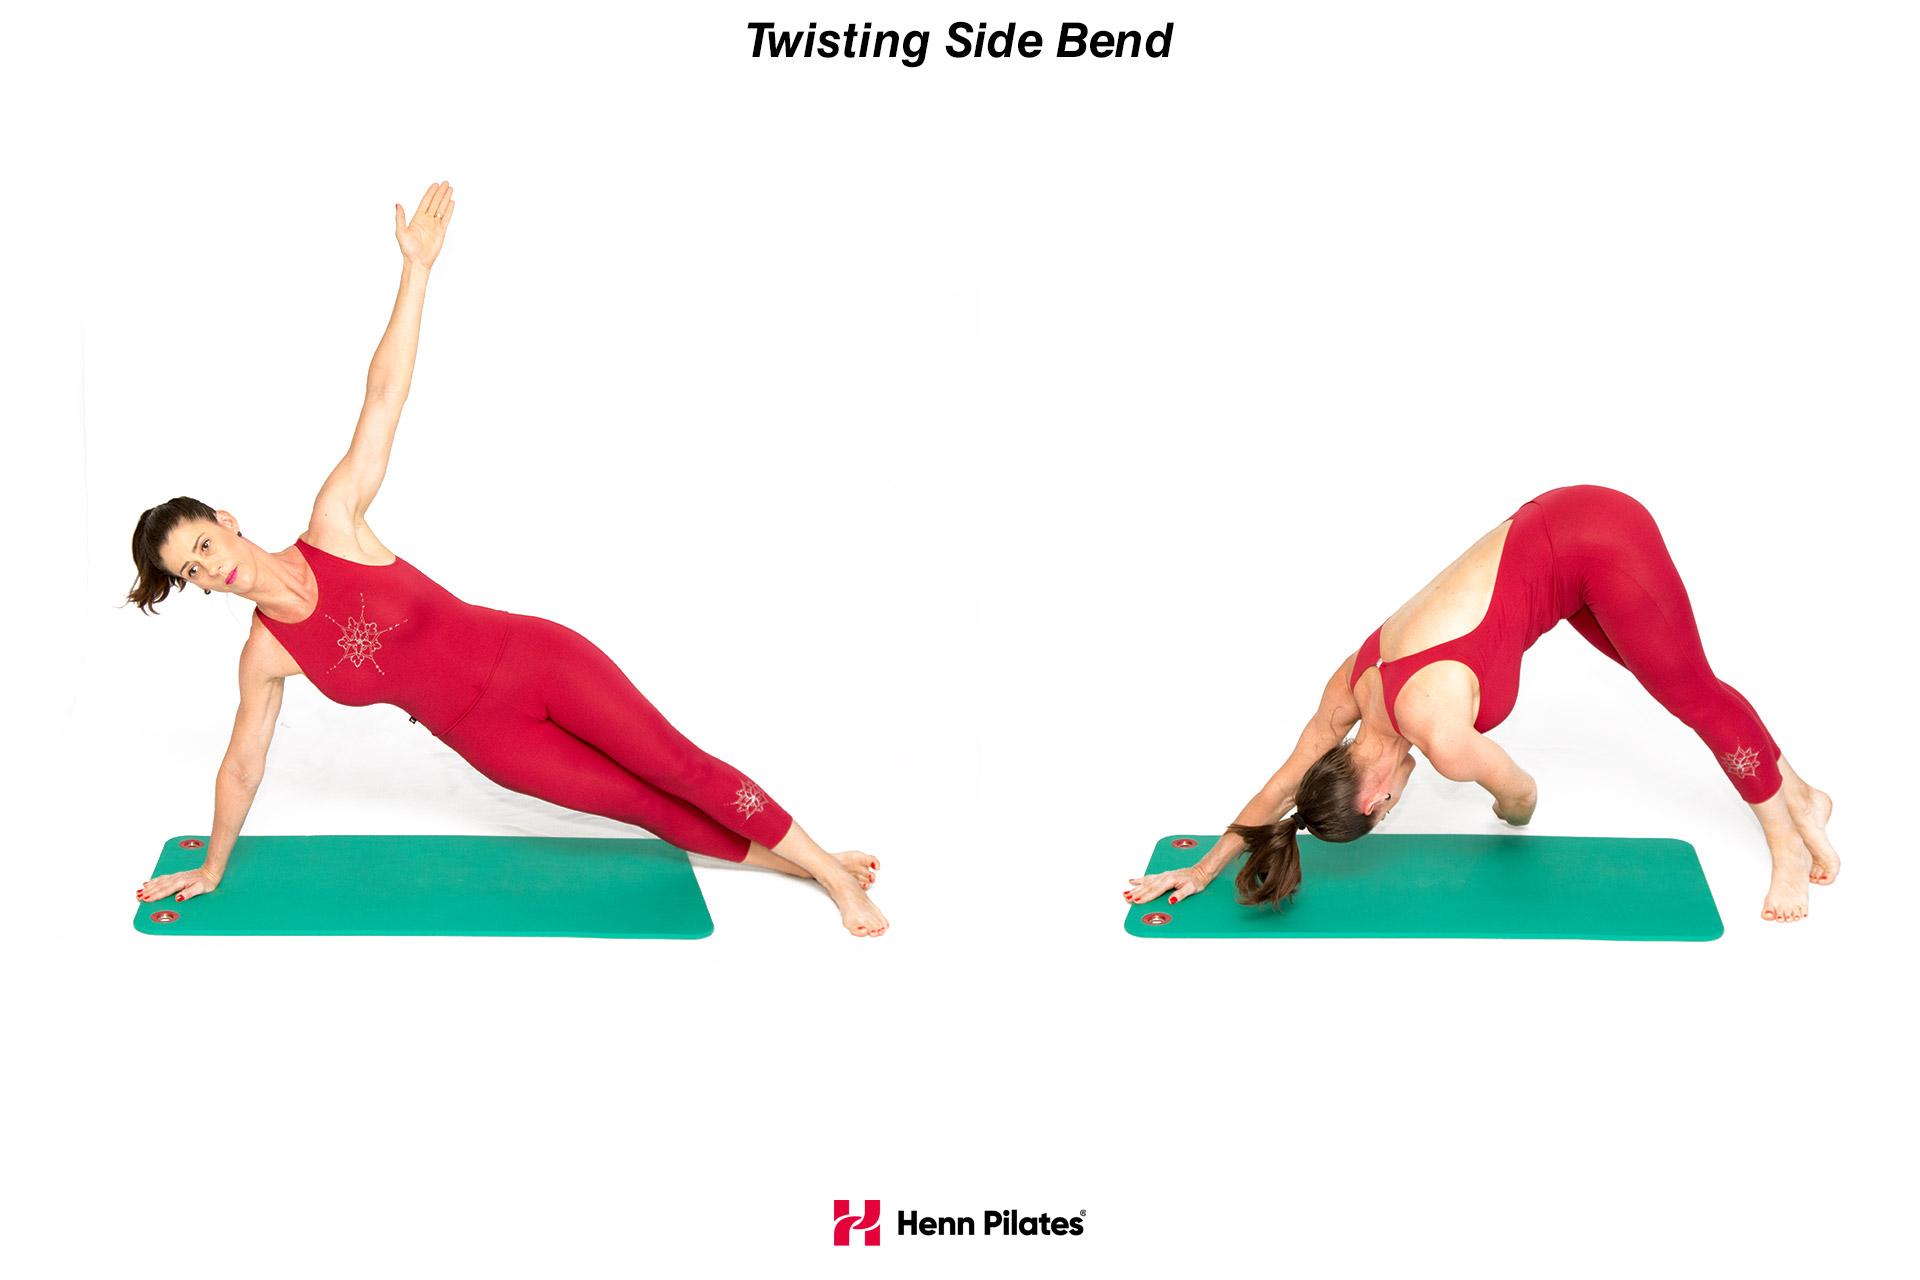 Twisting-Side-Bend